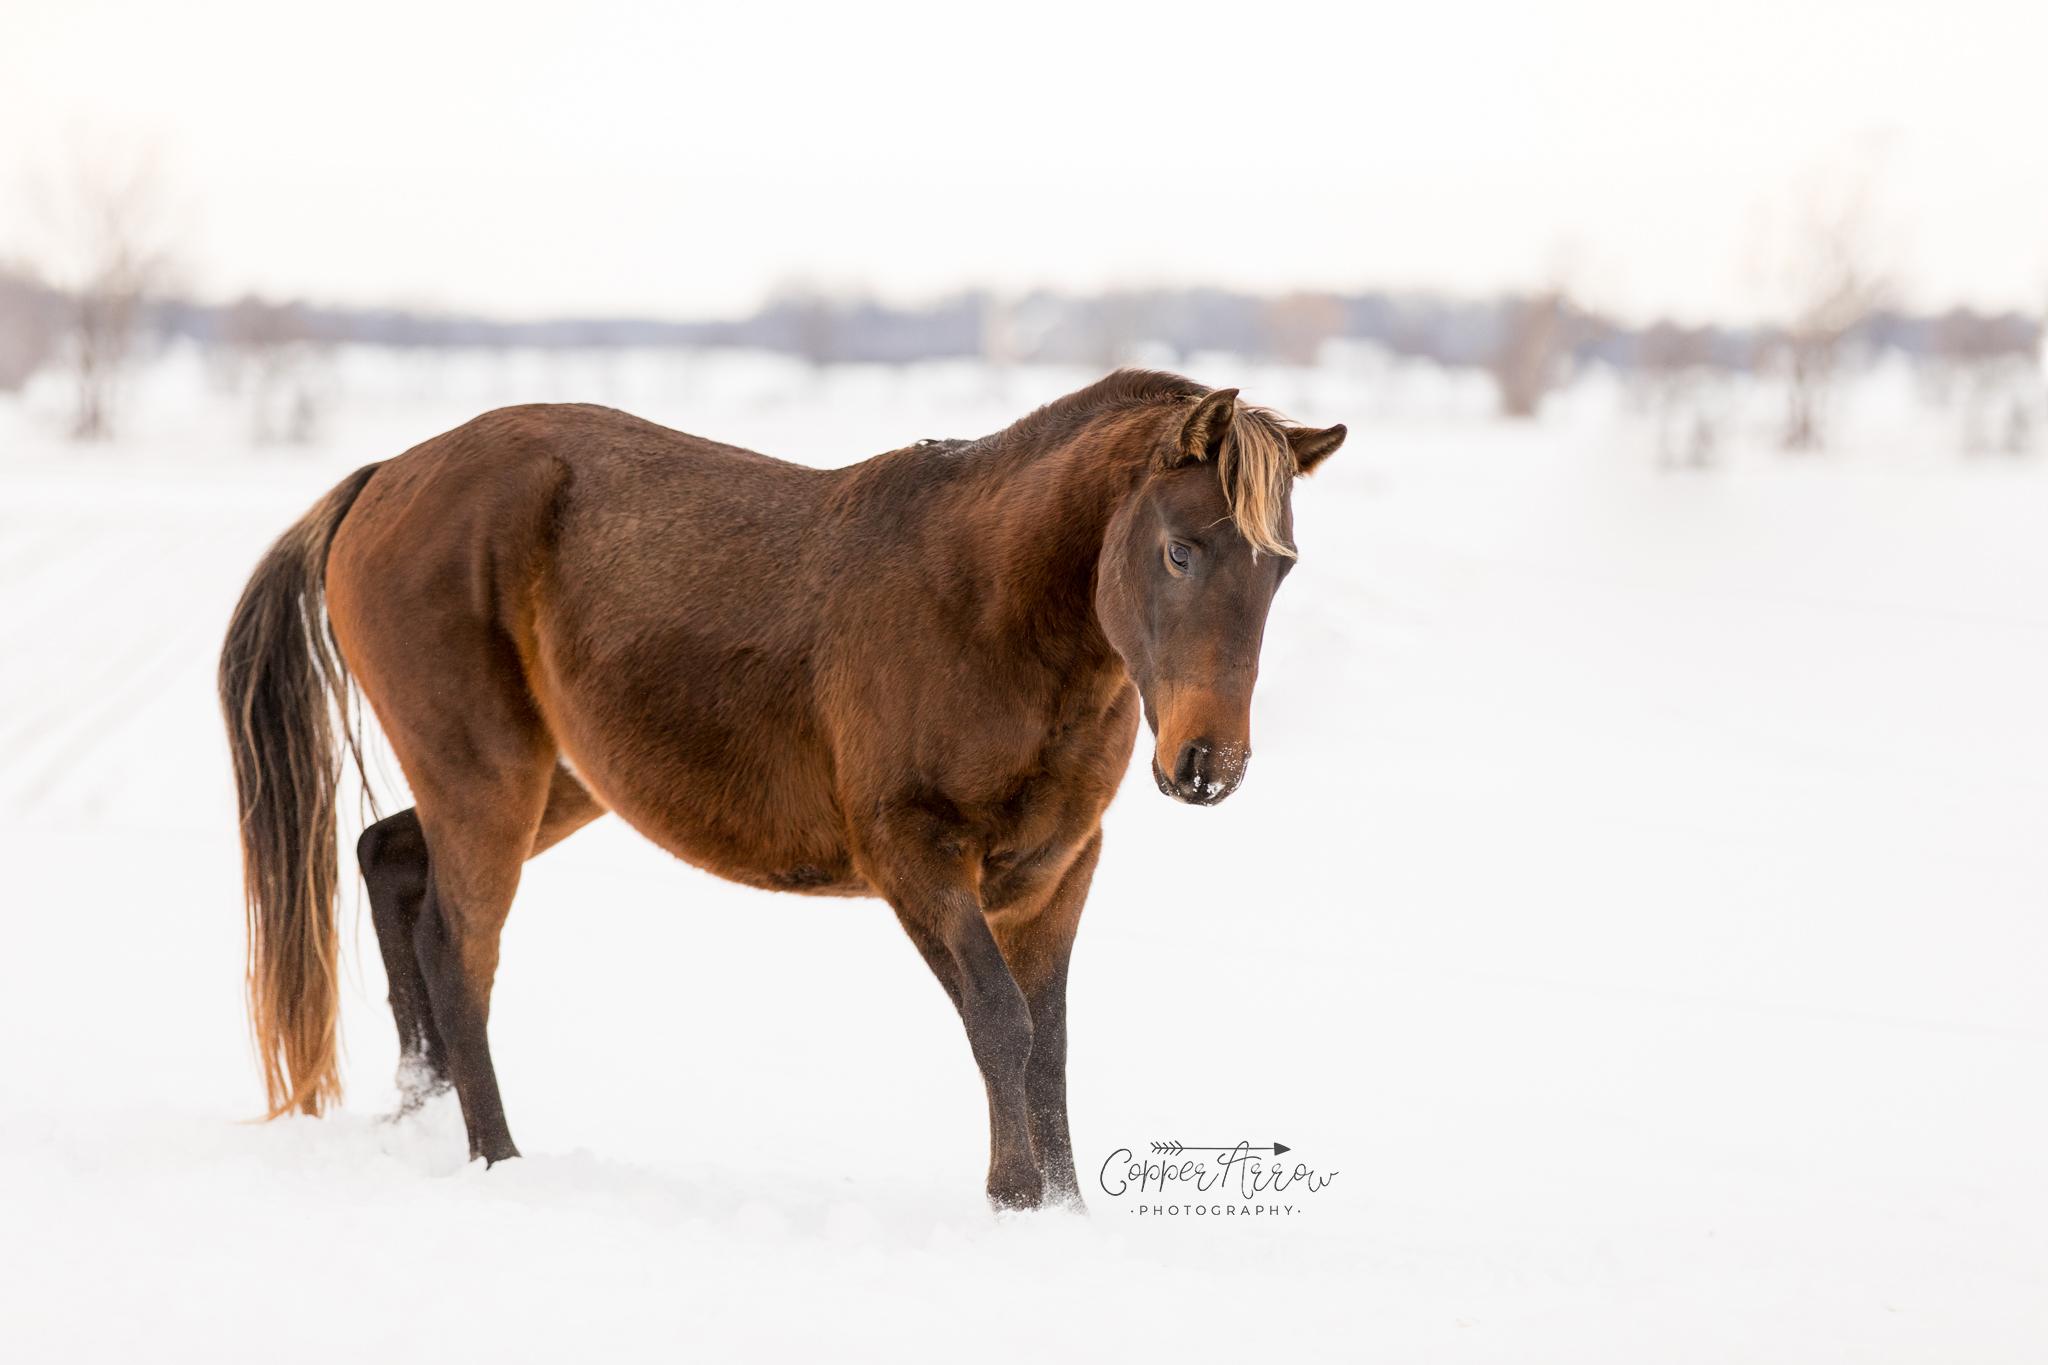 How to market my stallion